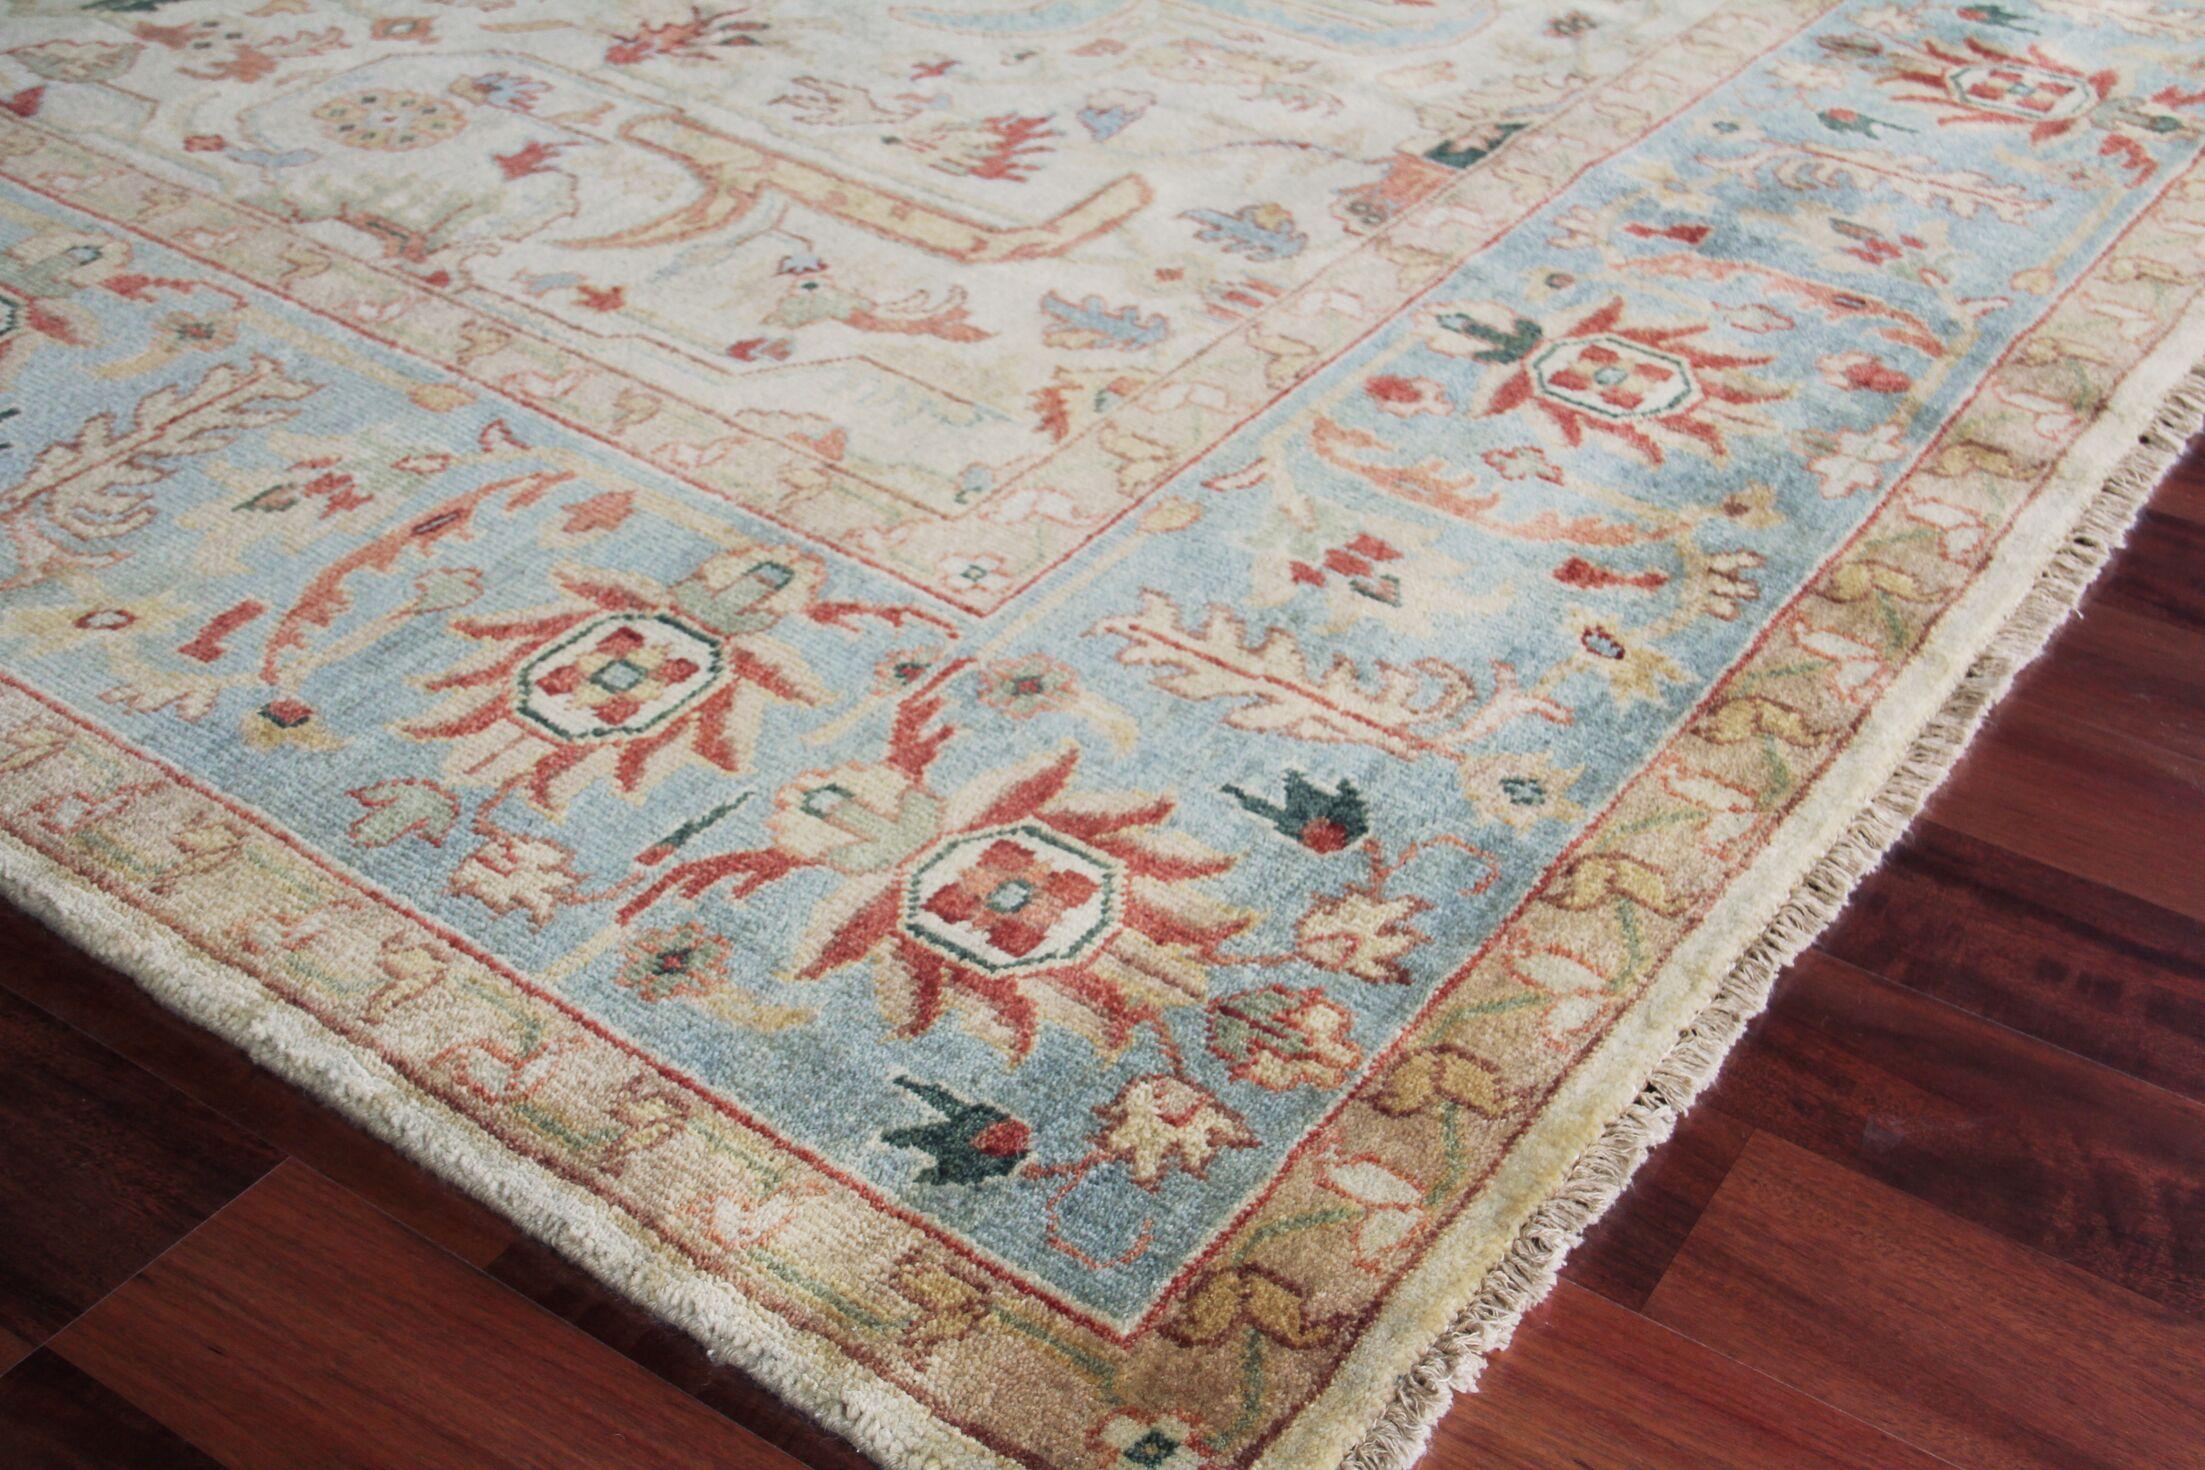 Serapi Hand-Knotted Wool Ivory/Light Blue Area Rug Rug Size: Rectangle 8' x 10'